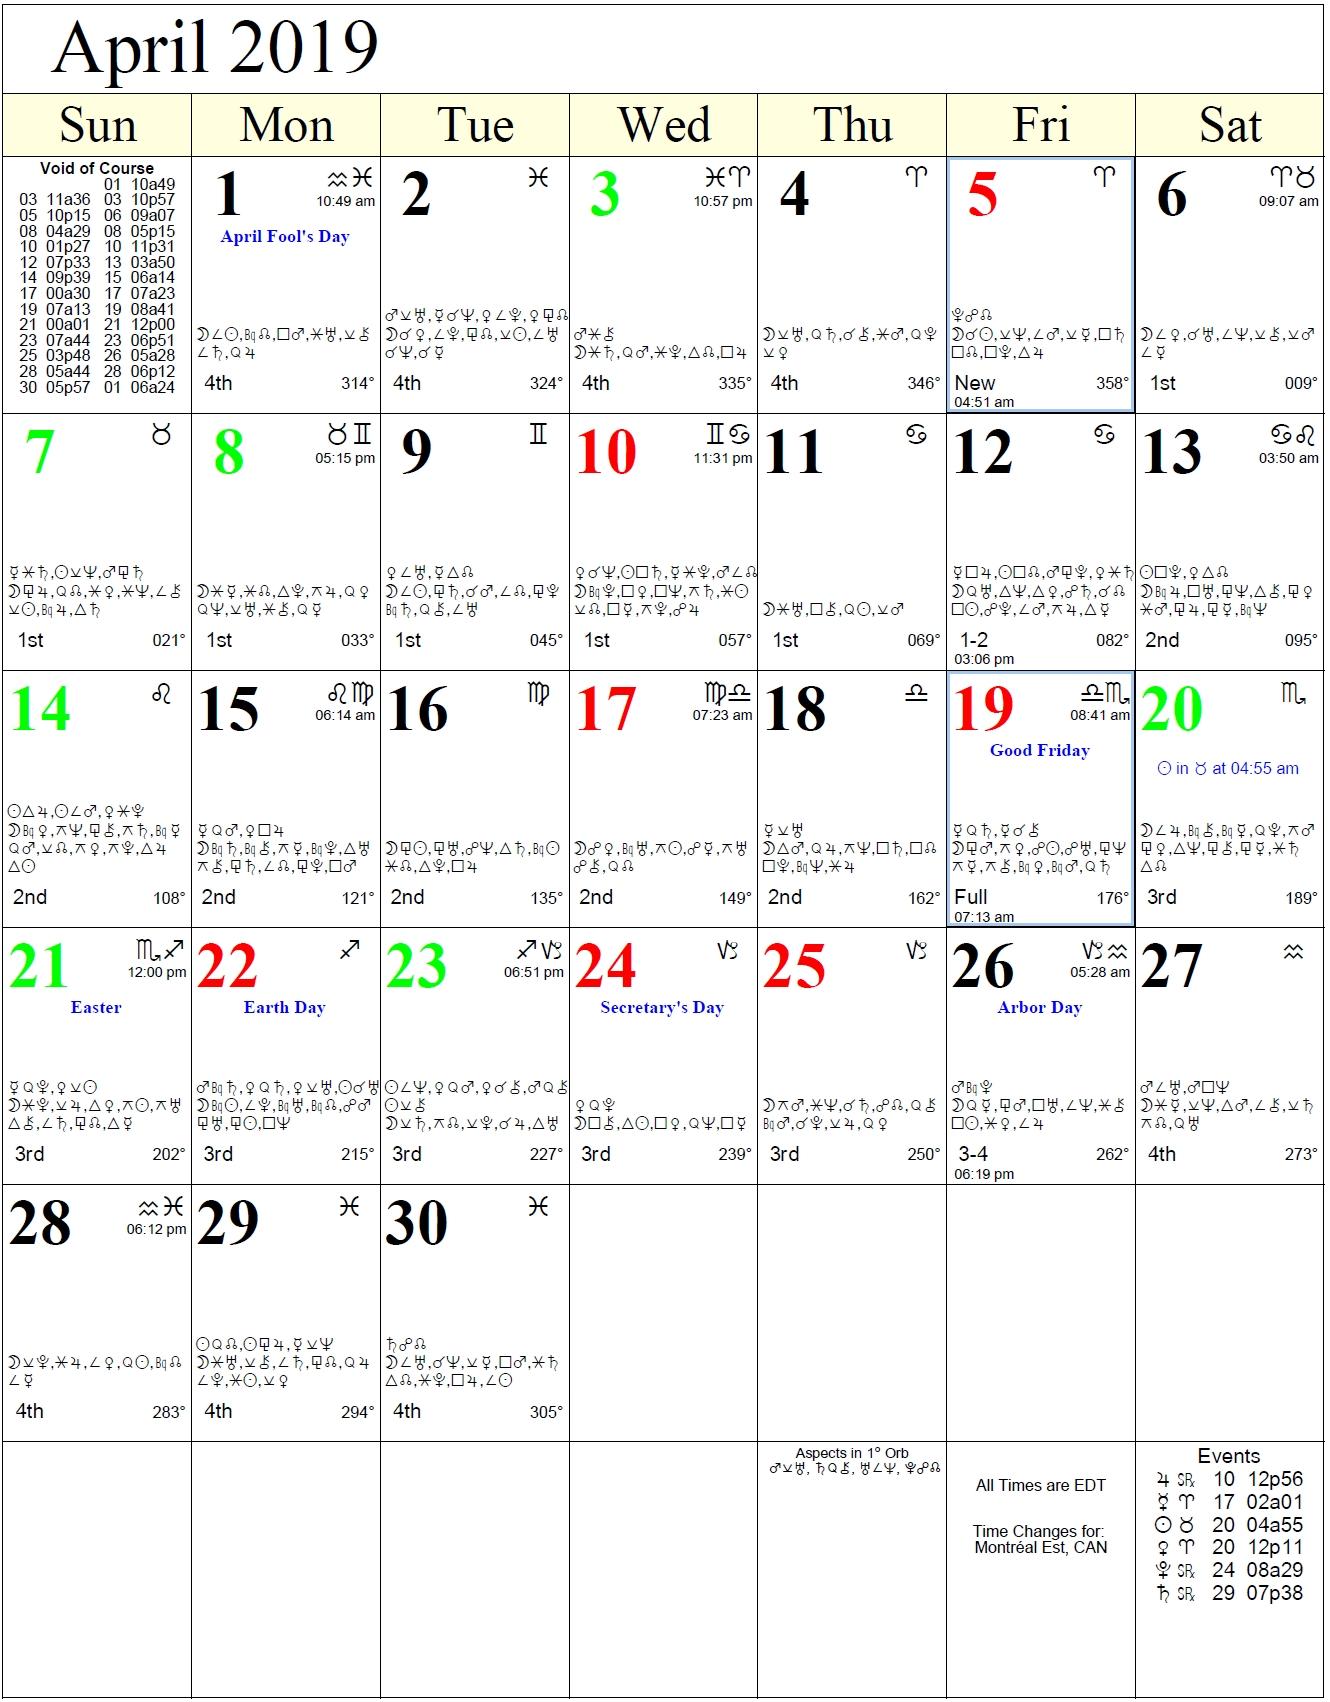 FQ4 Moon phase astrology Lunar Calendar Consider taking an